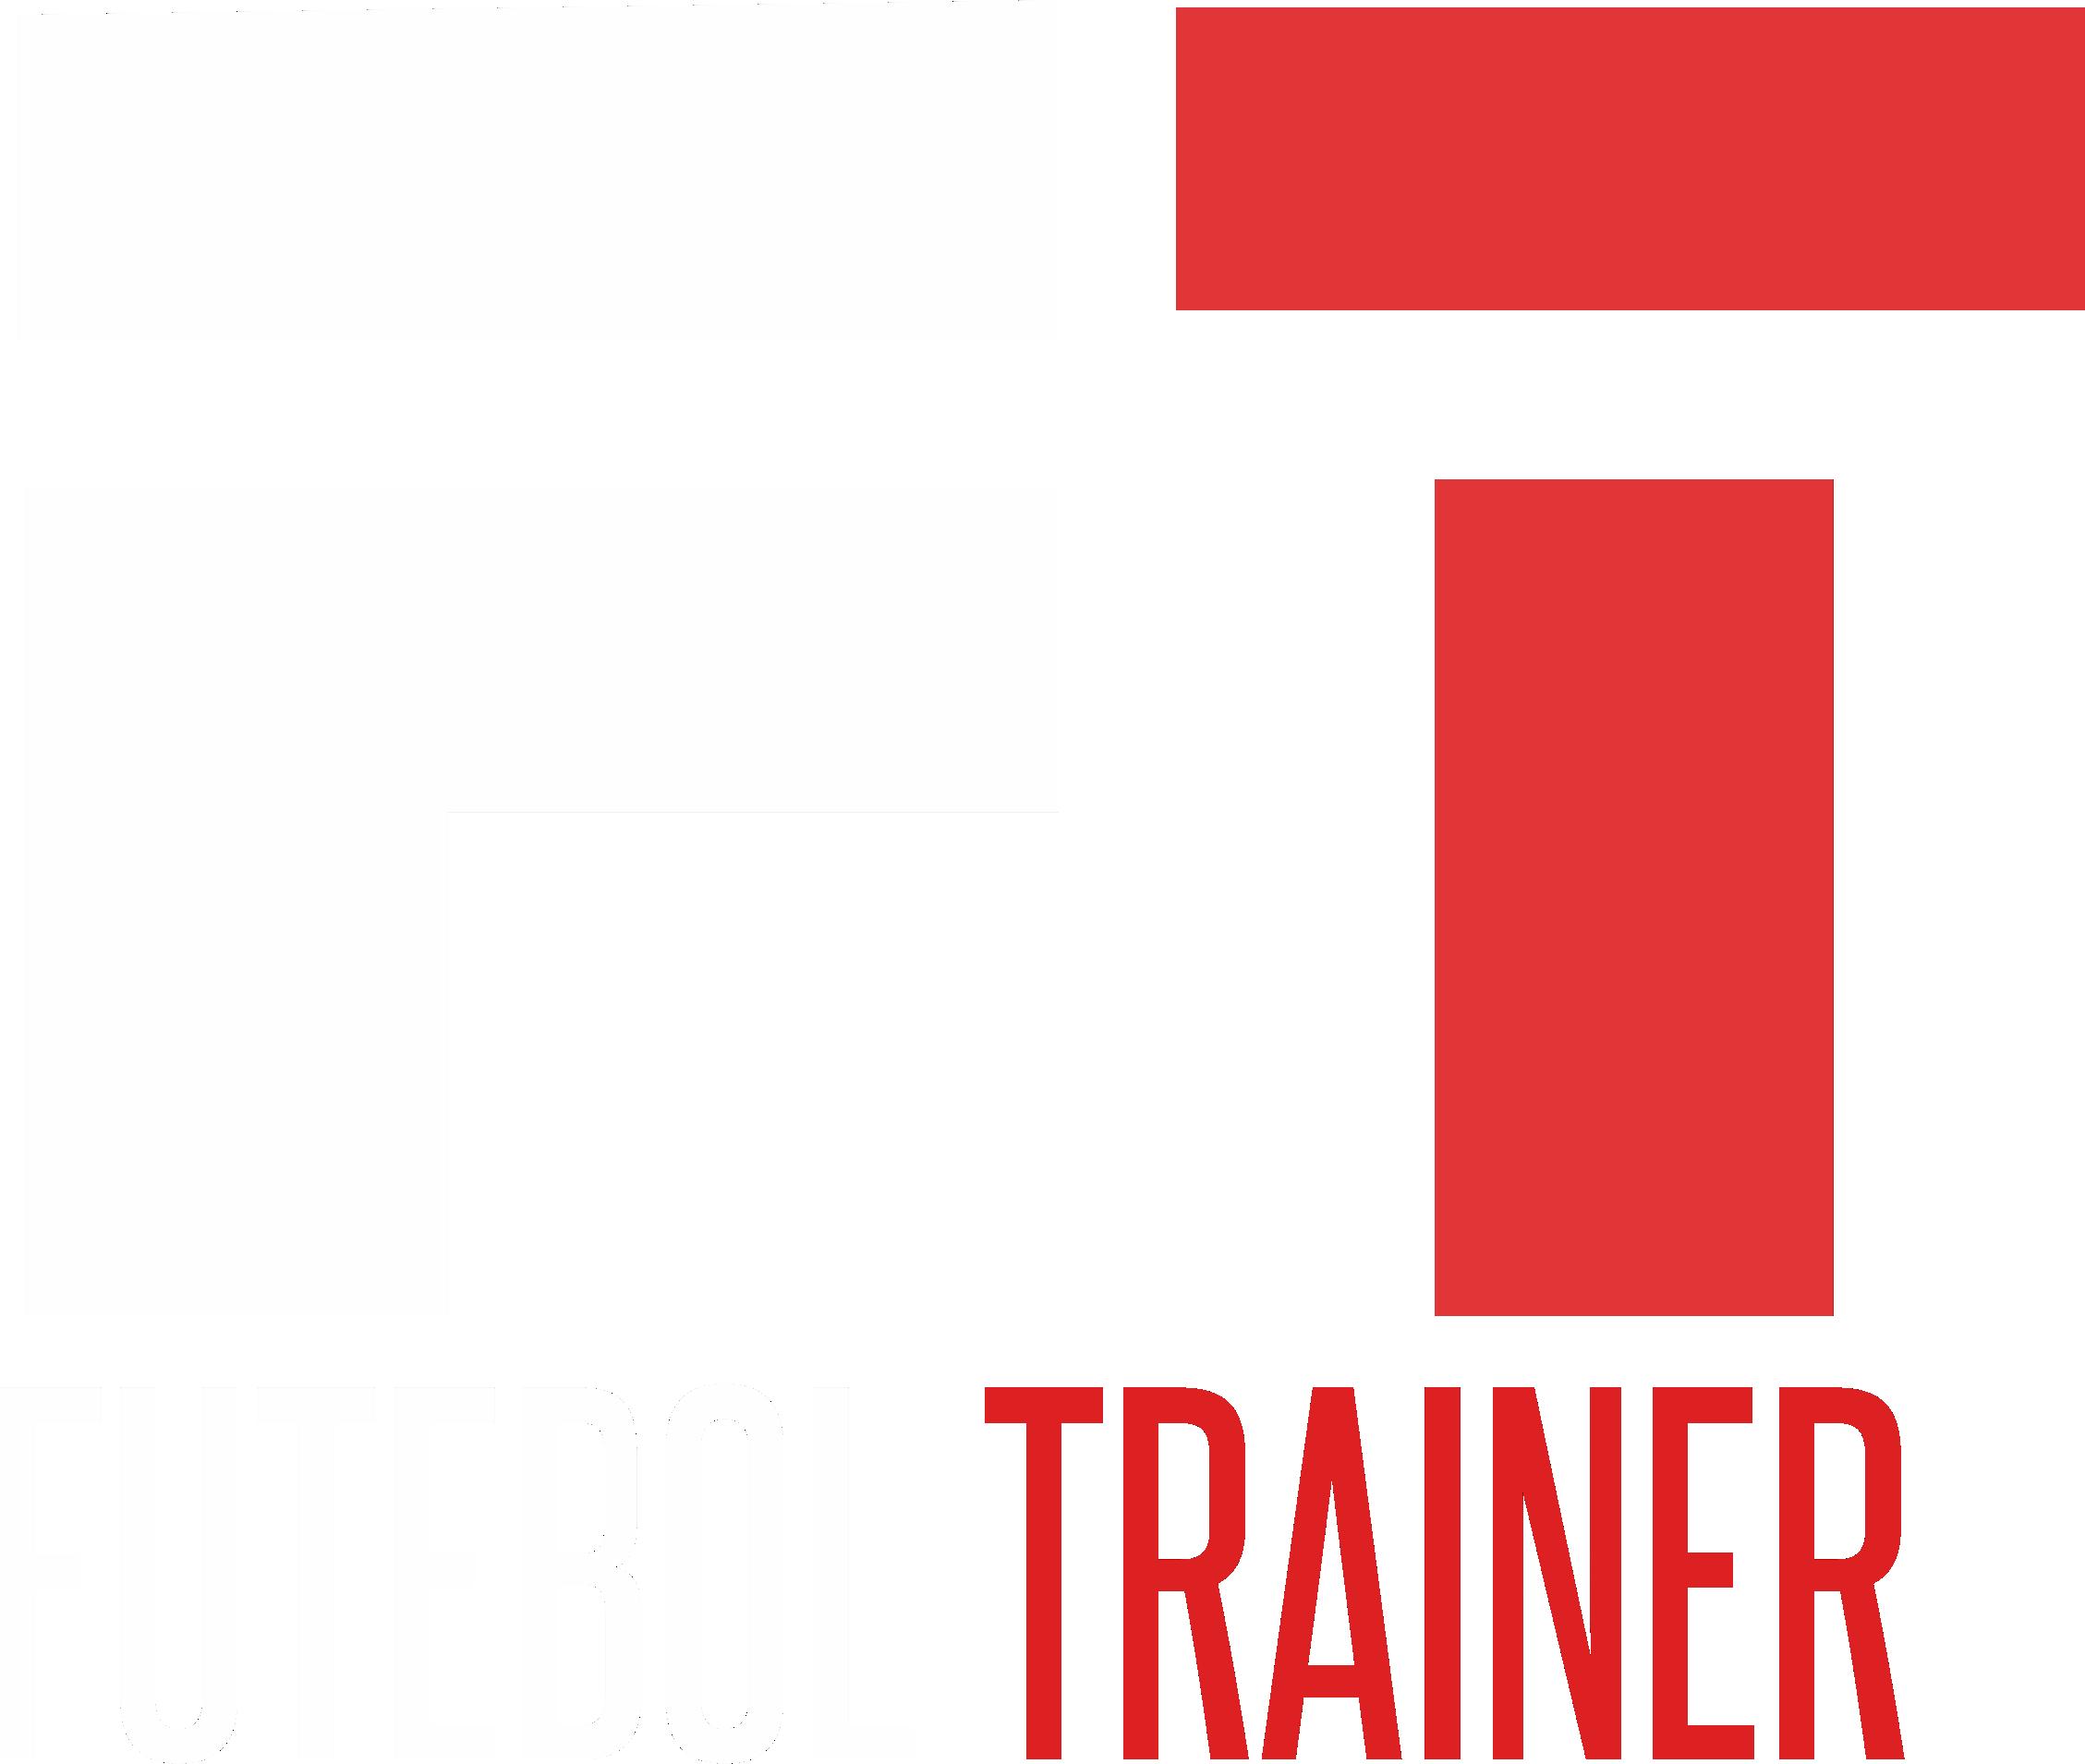 Futebol Trainer